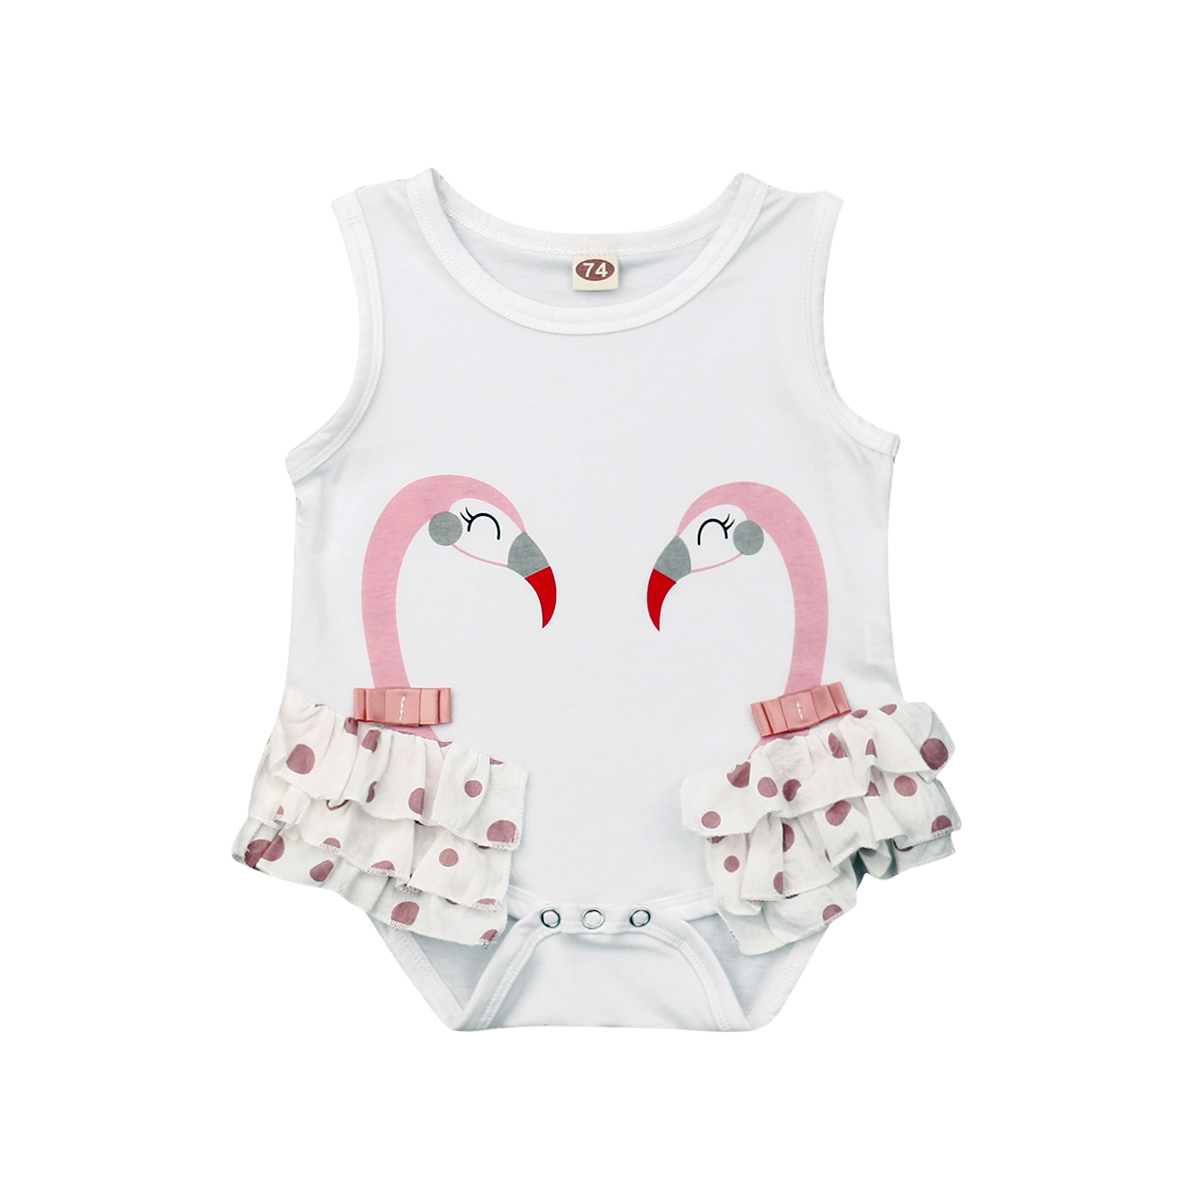 Flamingo On A Bicycle Infant Baby Girl Boy Bodysuit Jumpsuit Short Sleeve Bodysuit Tops Clothes